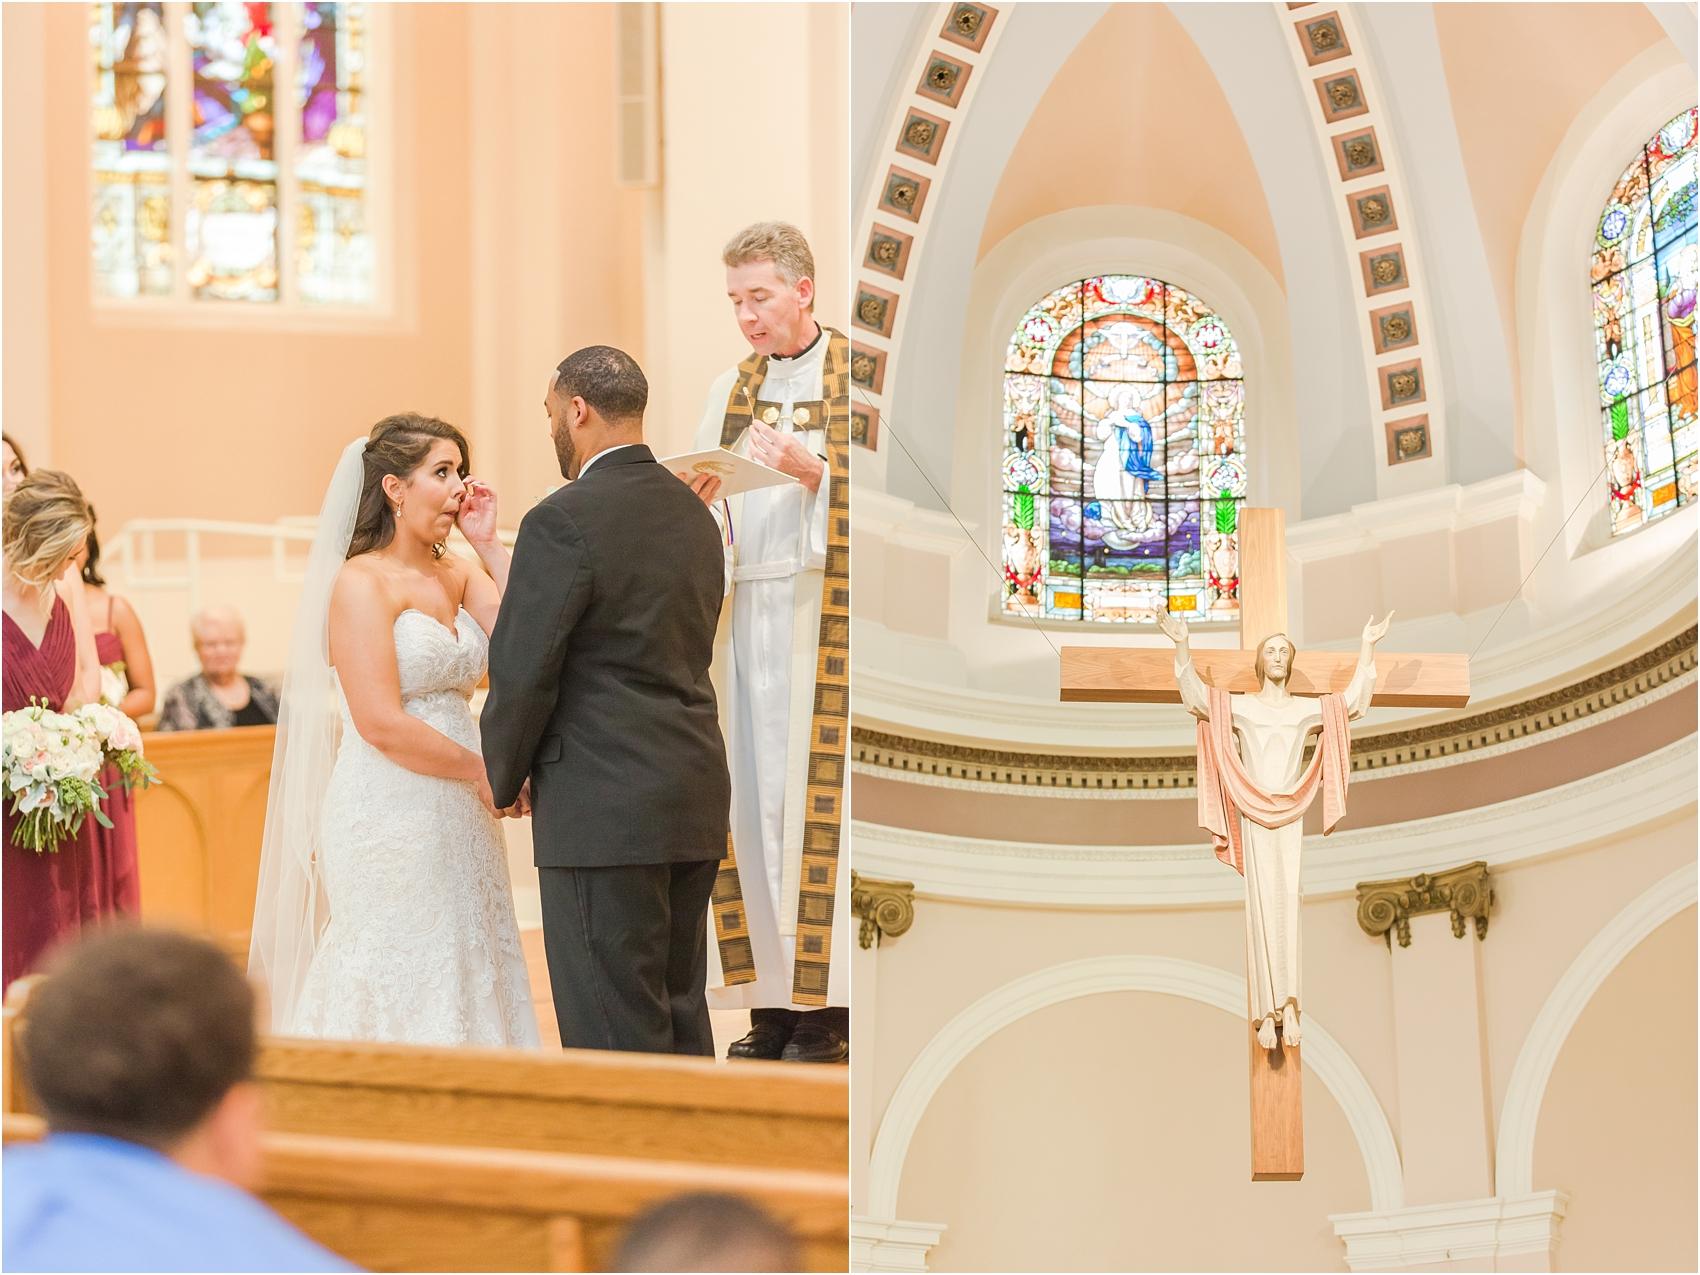 elegant-and-romantic-fall-wedding-photos-at-st-marys-catholic-church-in-monroe-michigan-by-courtney-carolyn-photography_0020.jpg